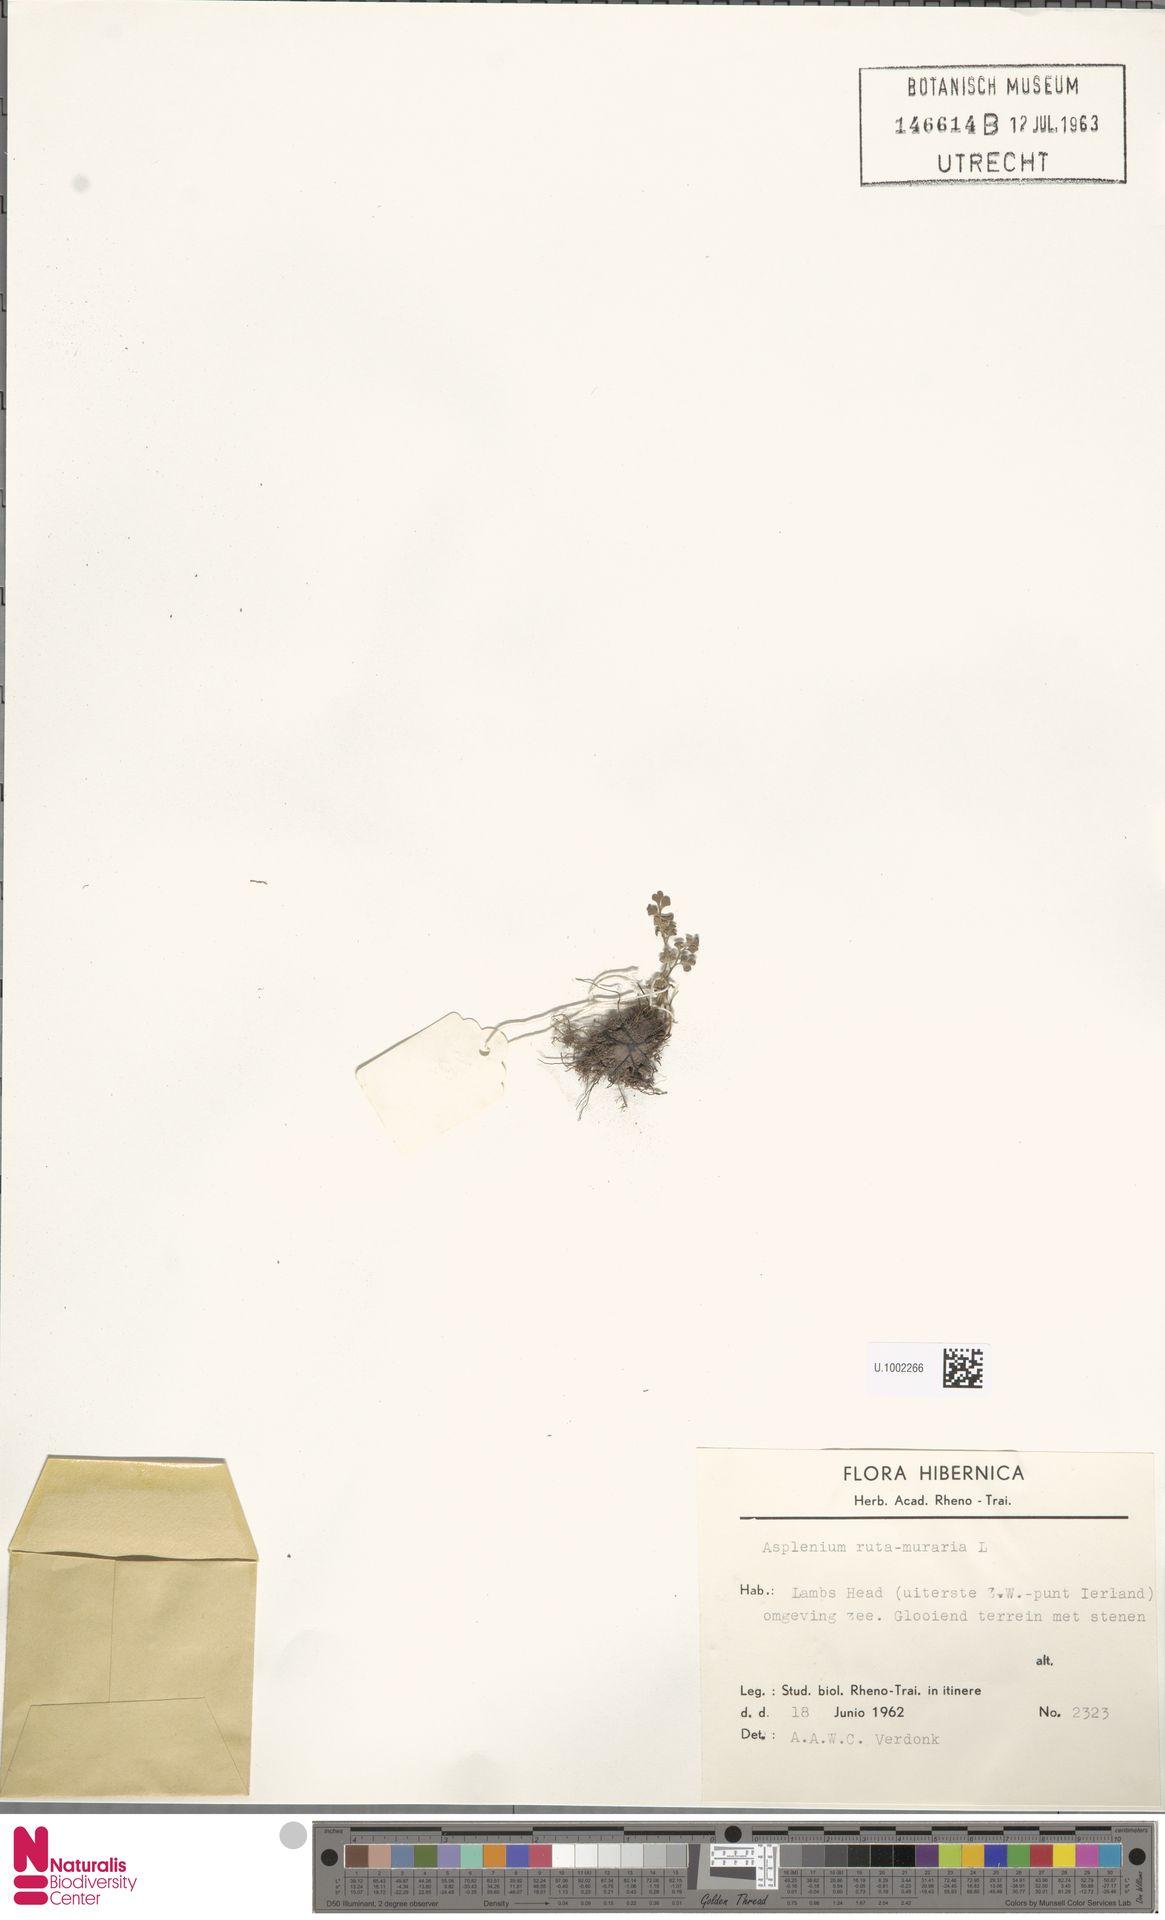 U.1002266 | Asplenium ruta-muraria L.